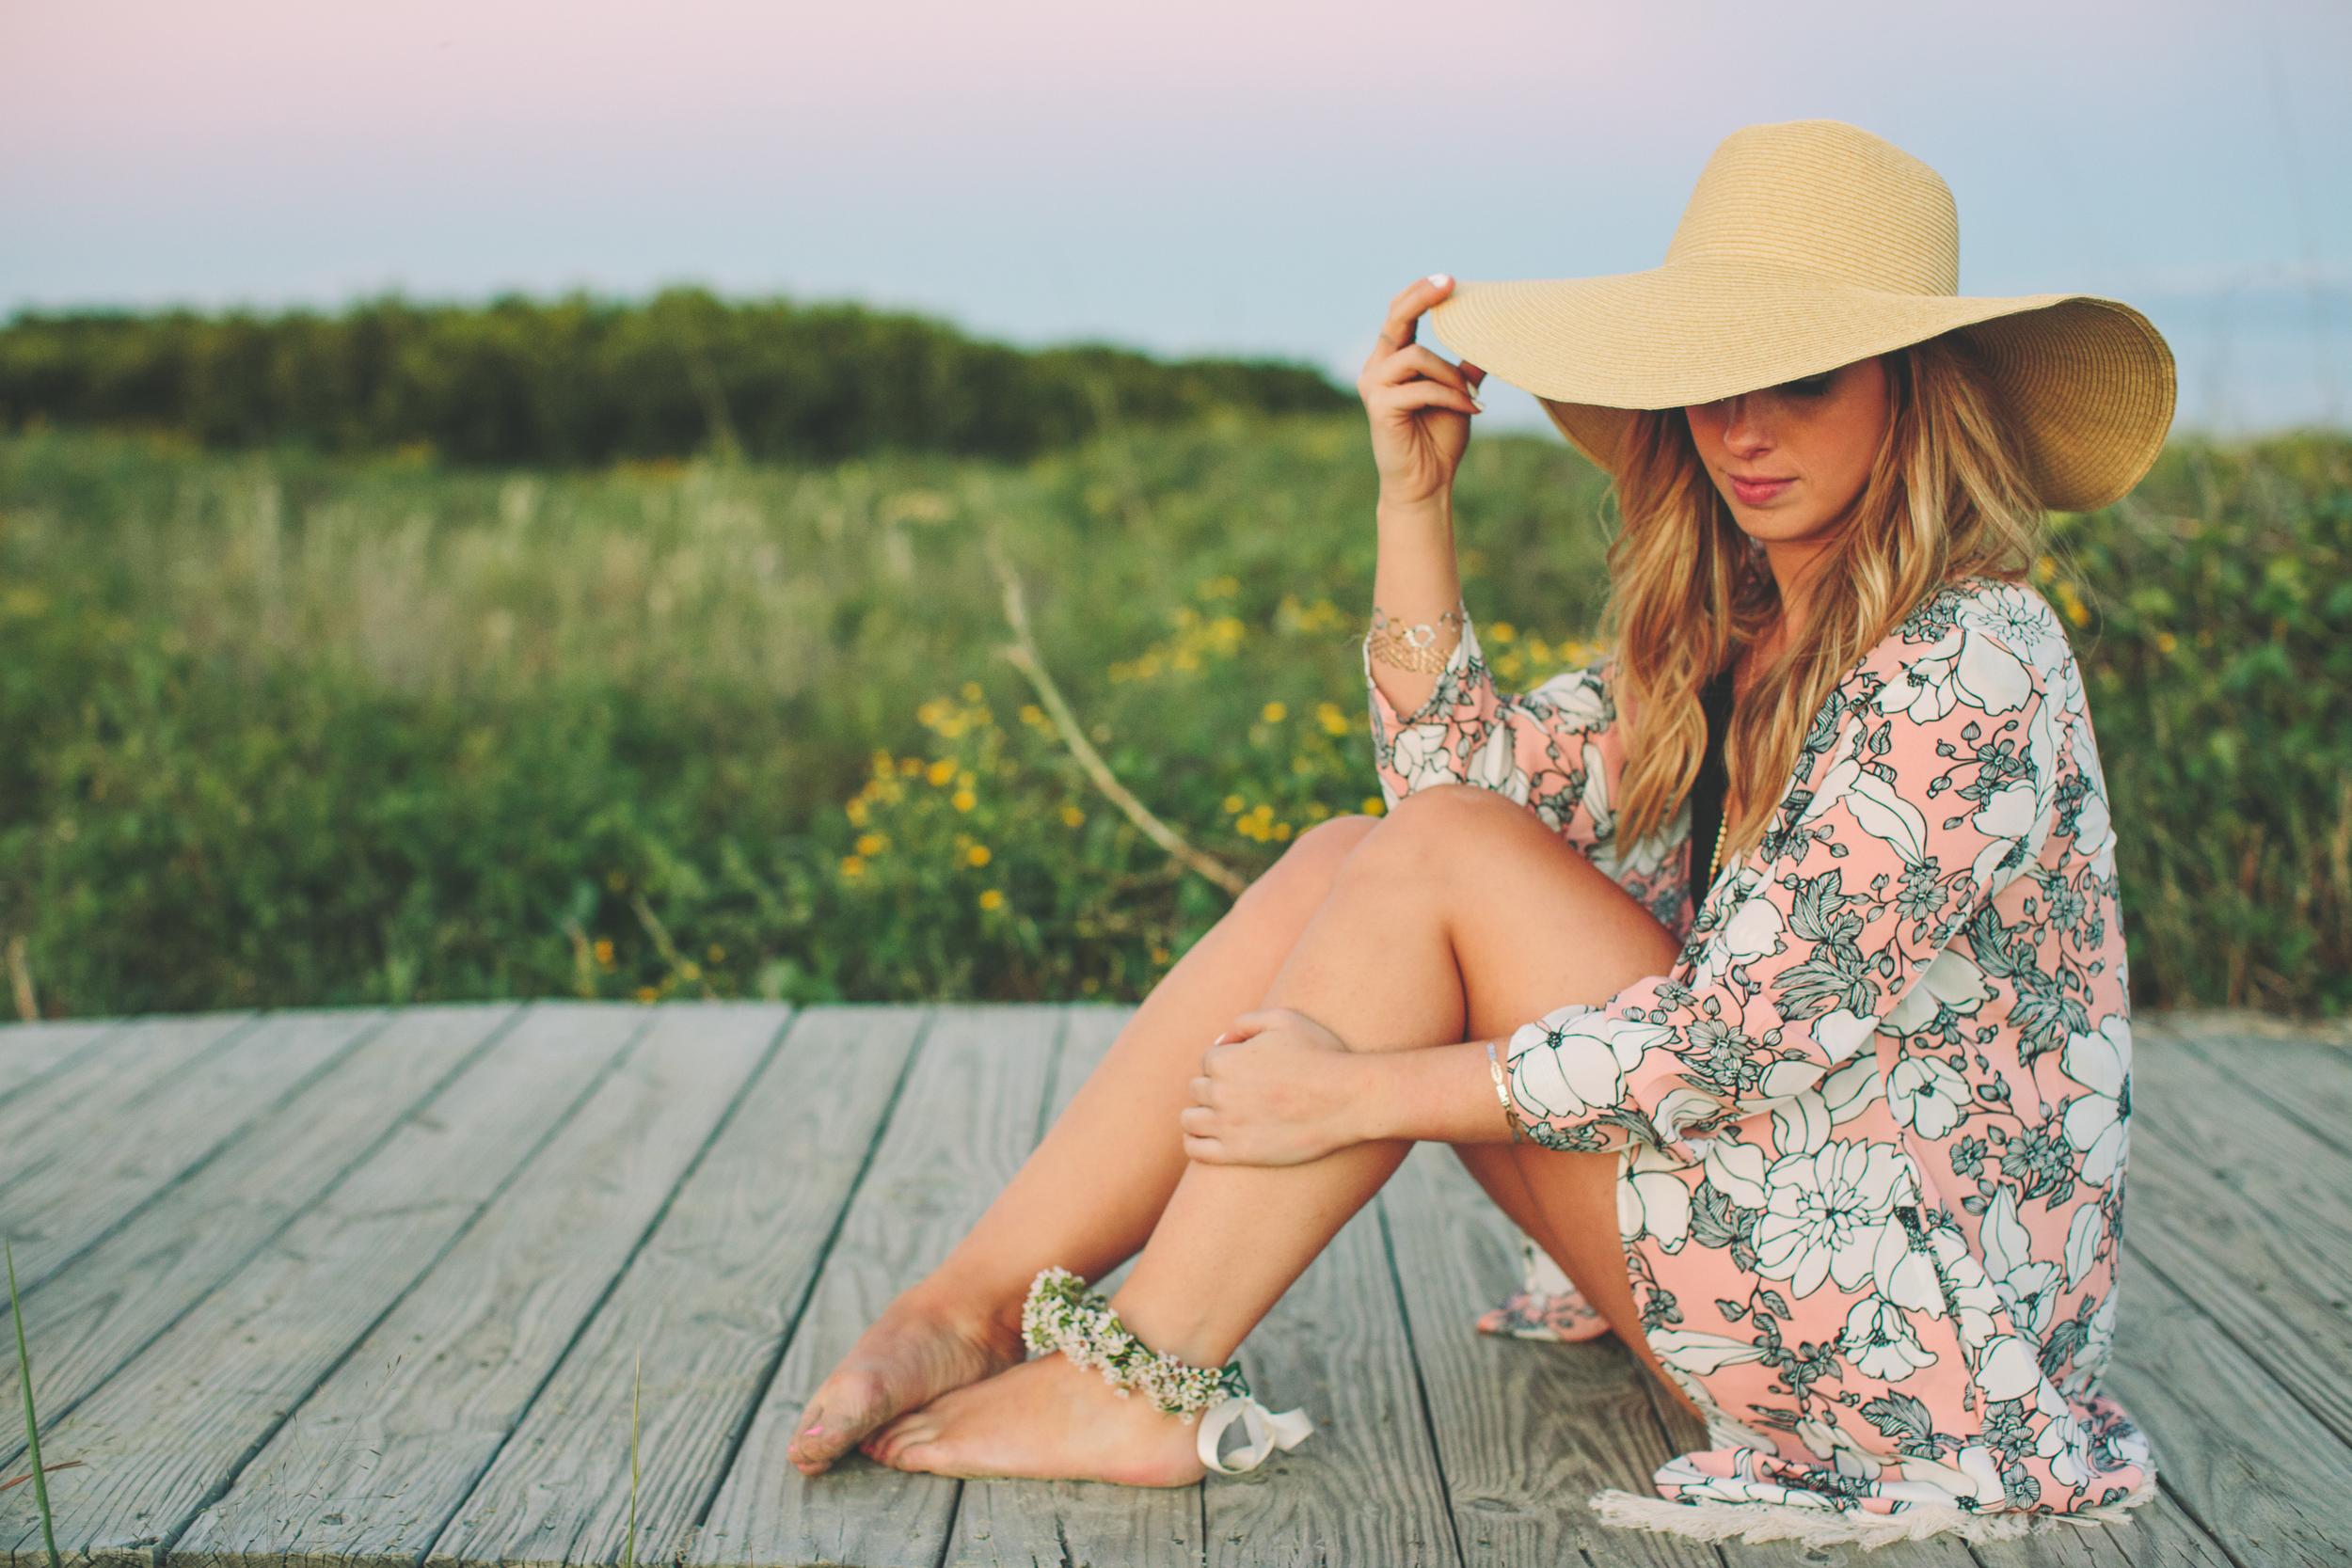 Honeymoon Packing Tips with Top Knots & Polka Dots